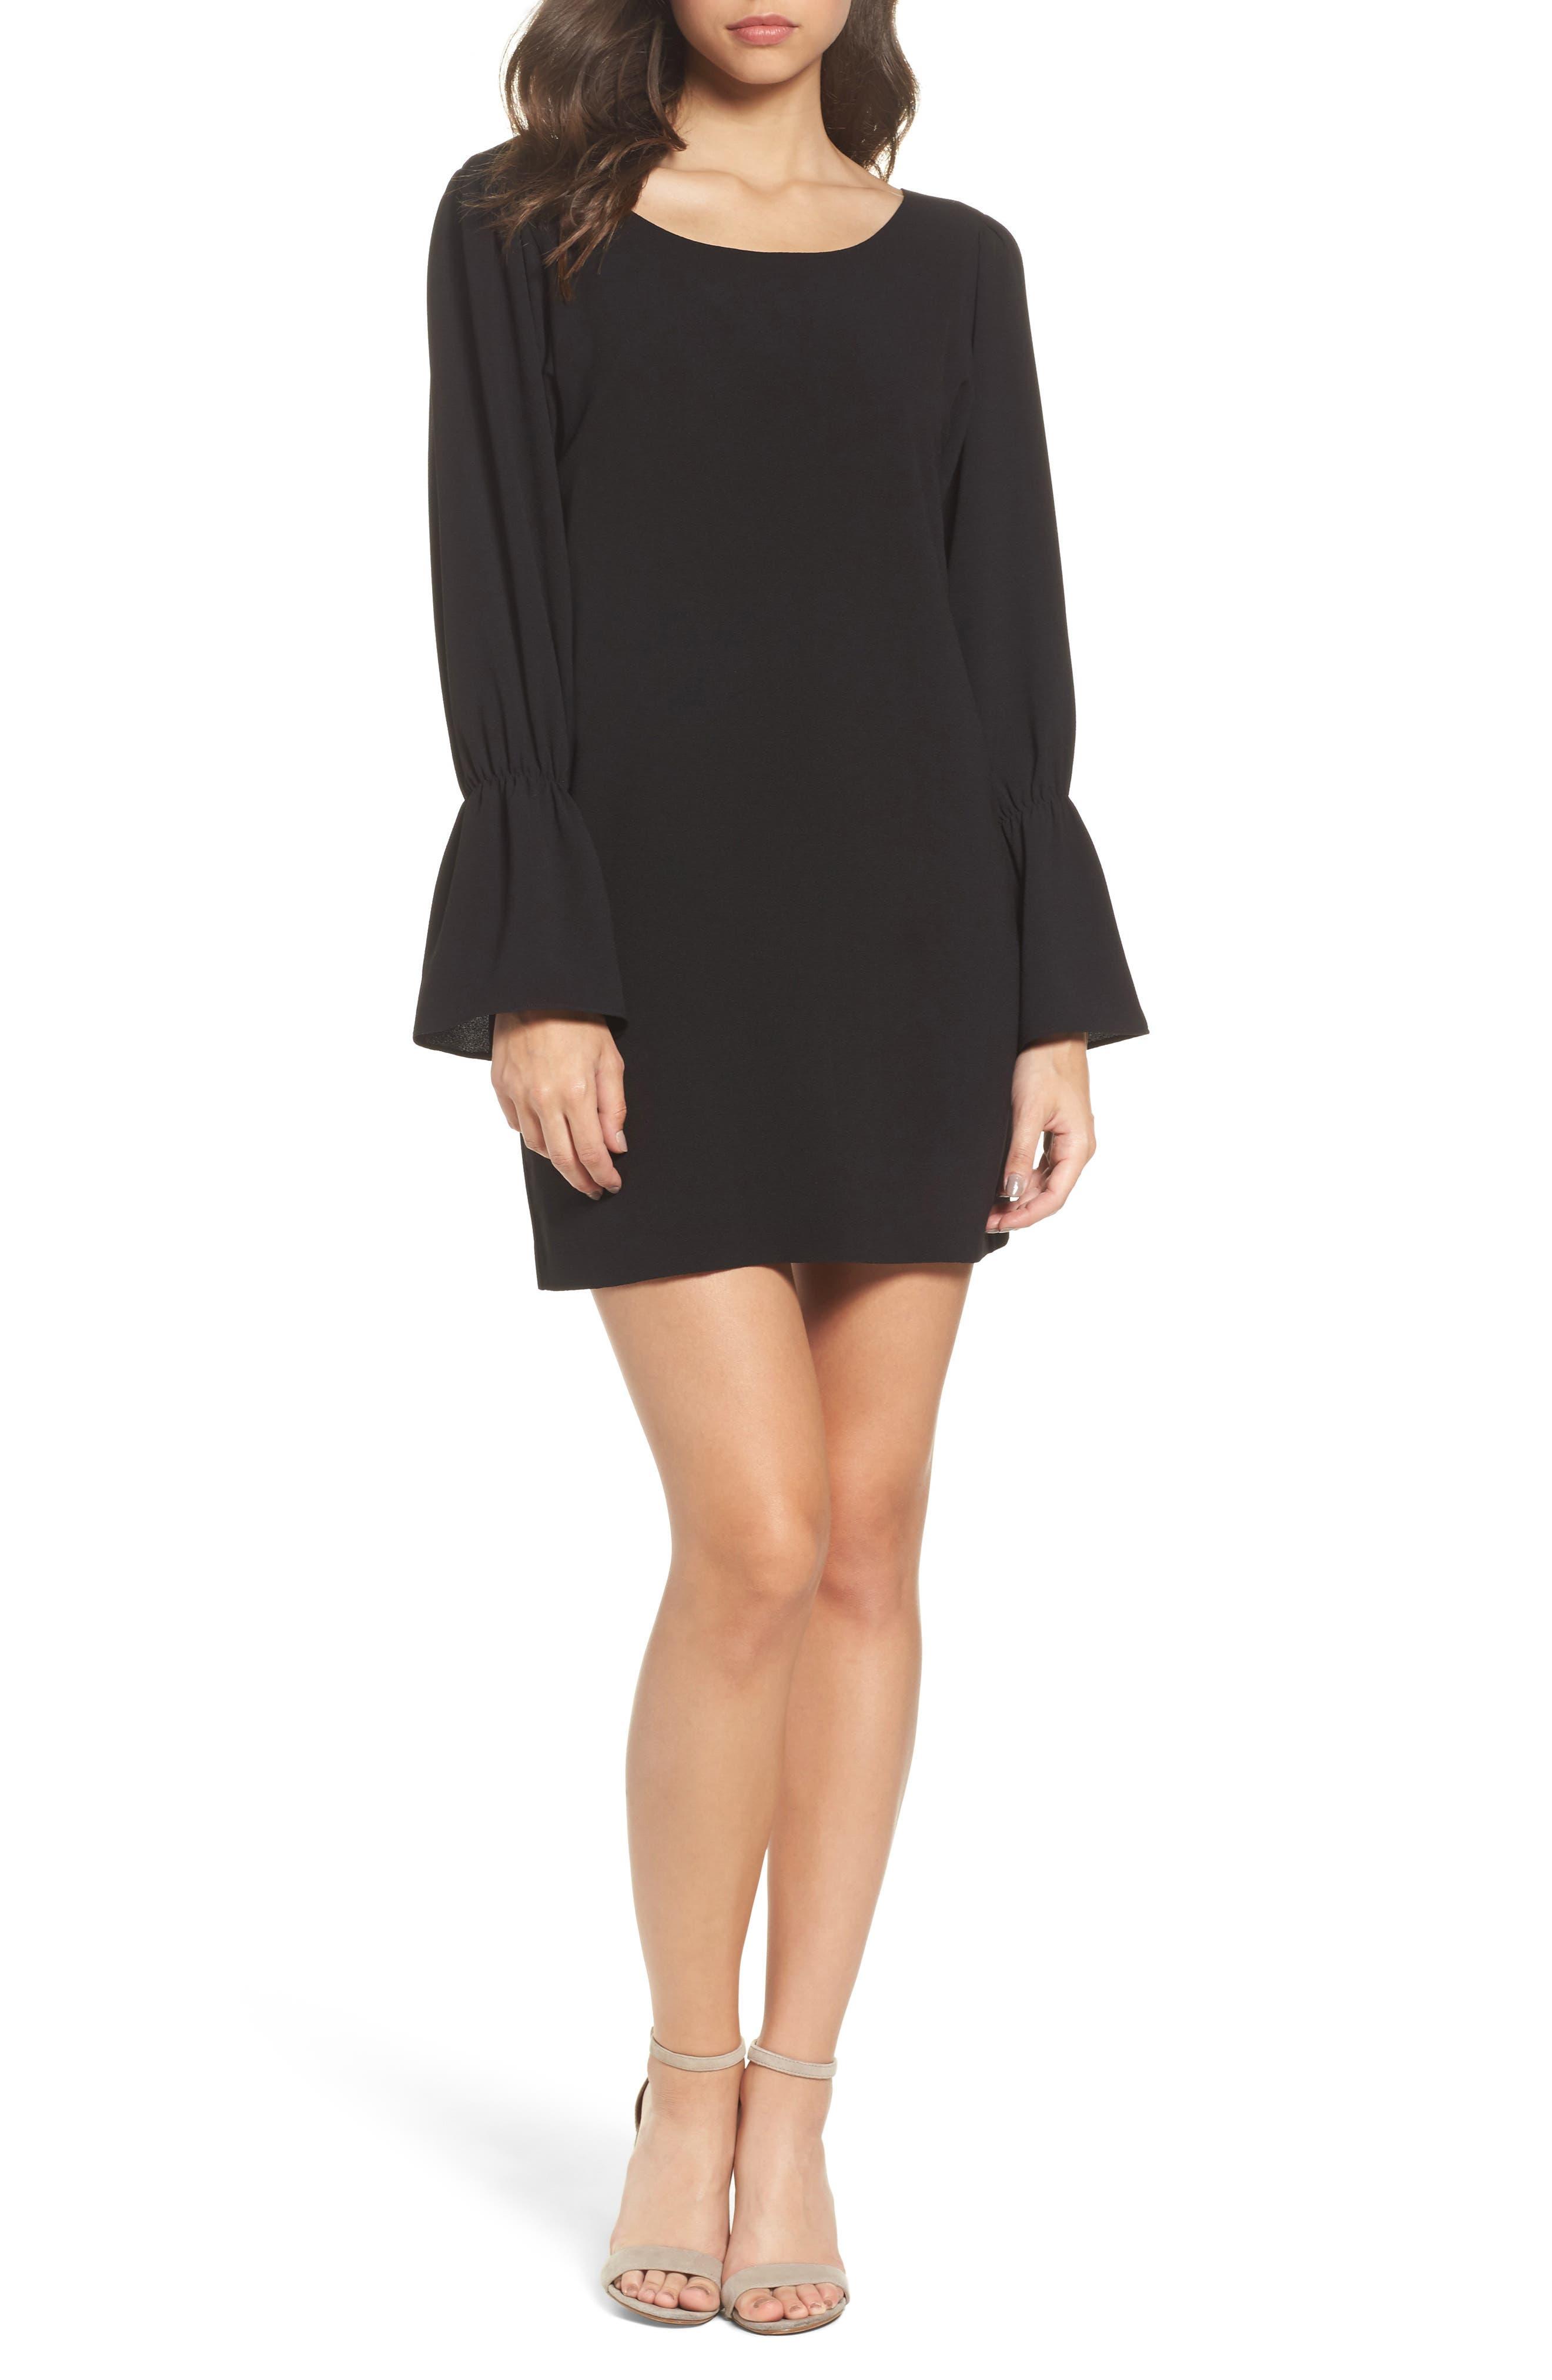 Alternate Image 1 Selected - Felicity & Coco Farrah Cross Back Minidress (Nordstrom Exclusive)